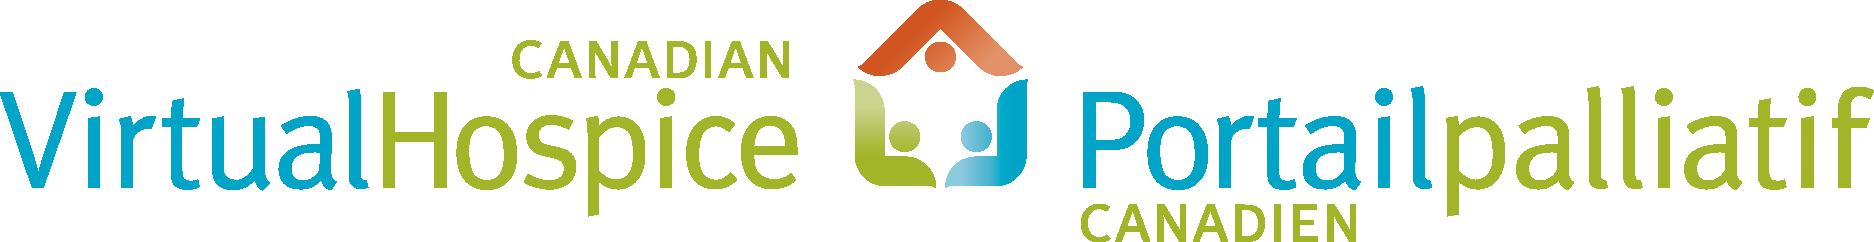 Virtual Hospice bilingual logo